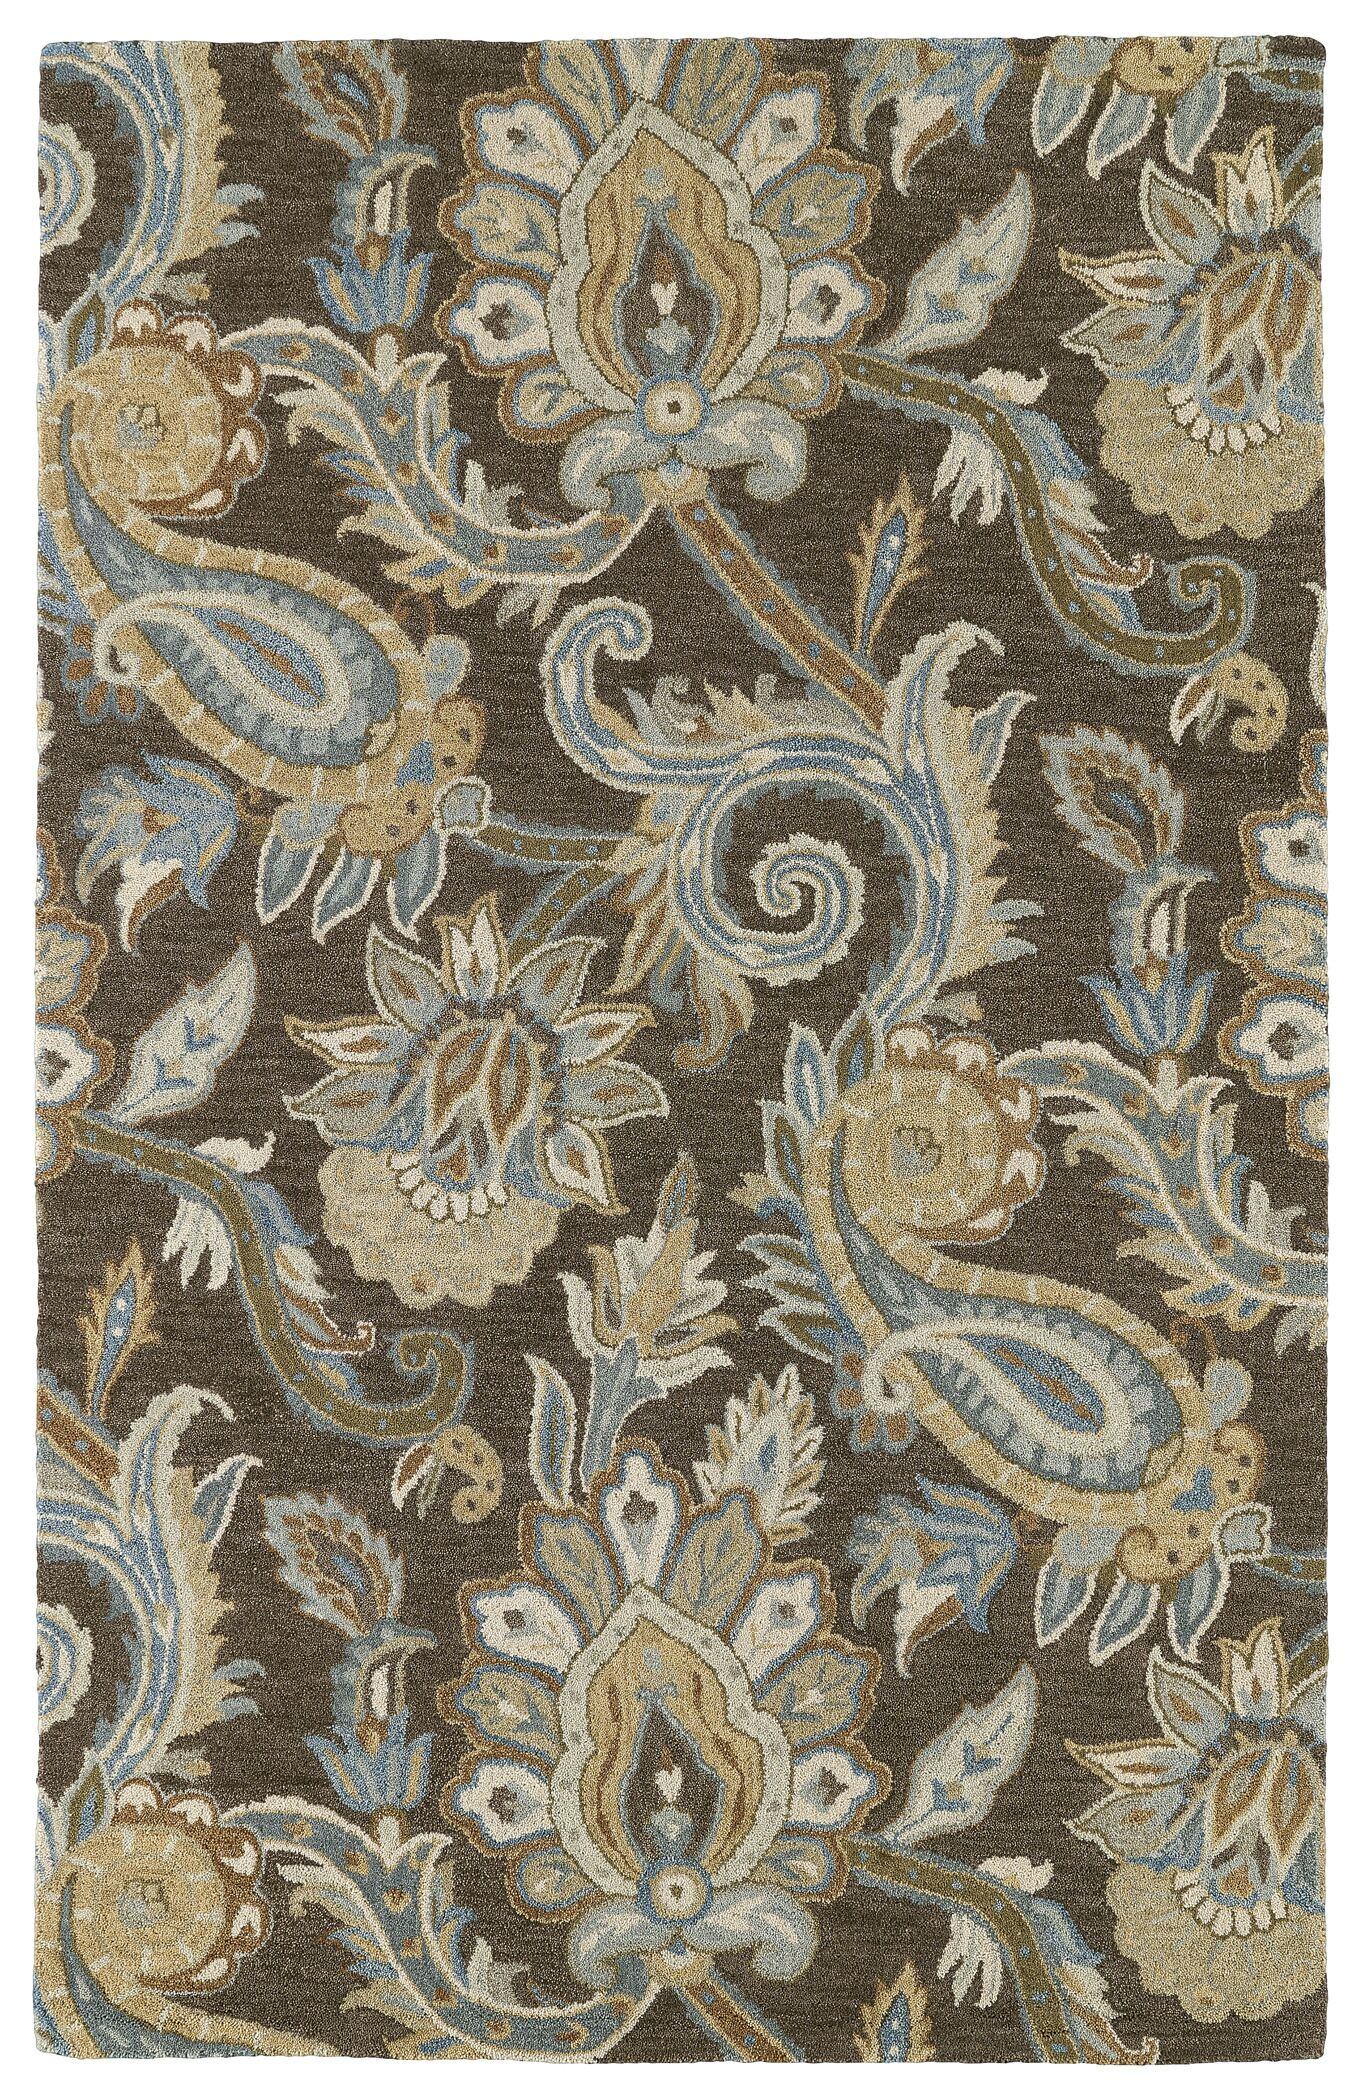 Casper Brown Odyusseus Brown/Tan Floral Area Rug Rug Size: Rectangle 9' x 12'